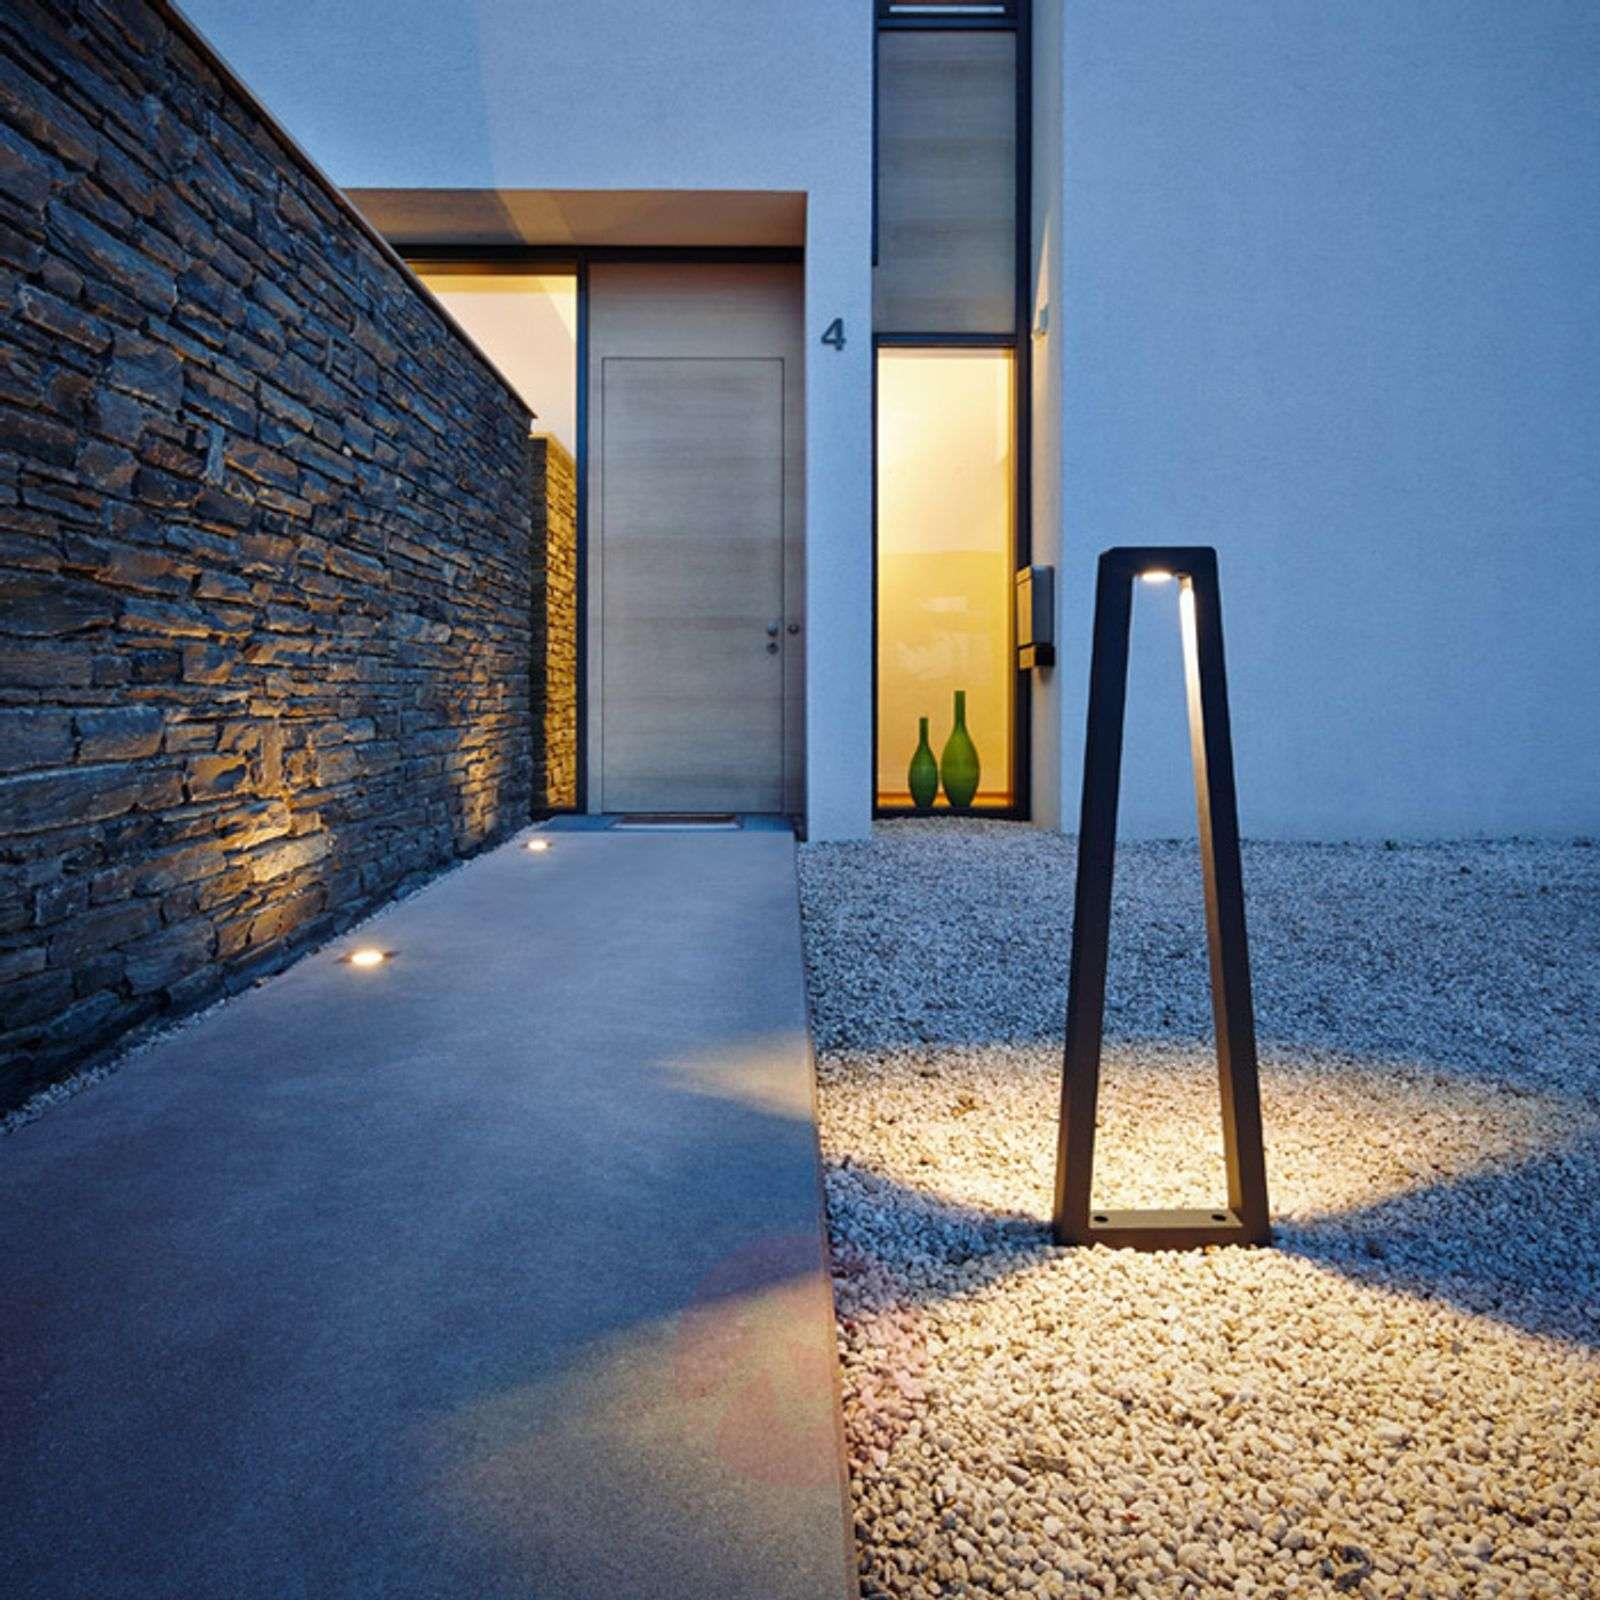 Designer-ulkokoristevalaisin Bookat LED-valolla-5504661-01